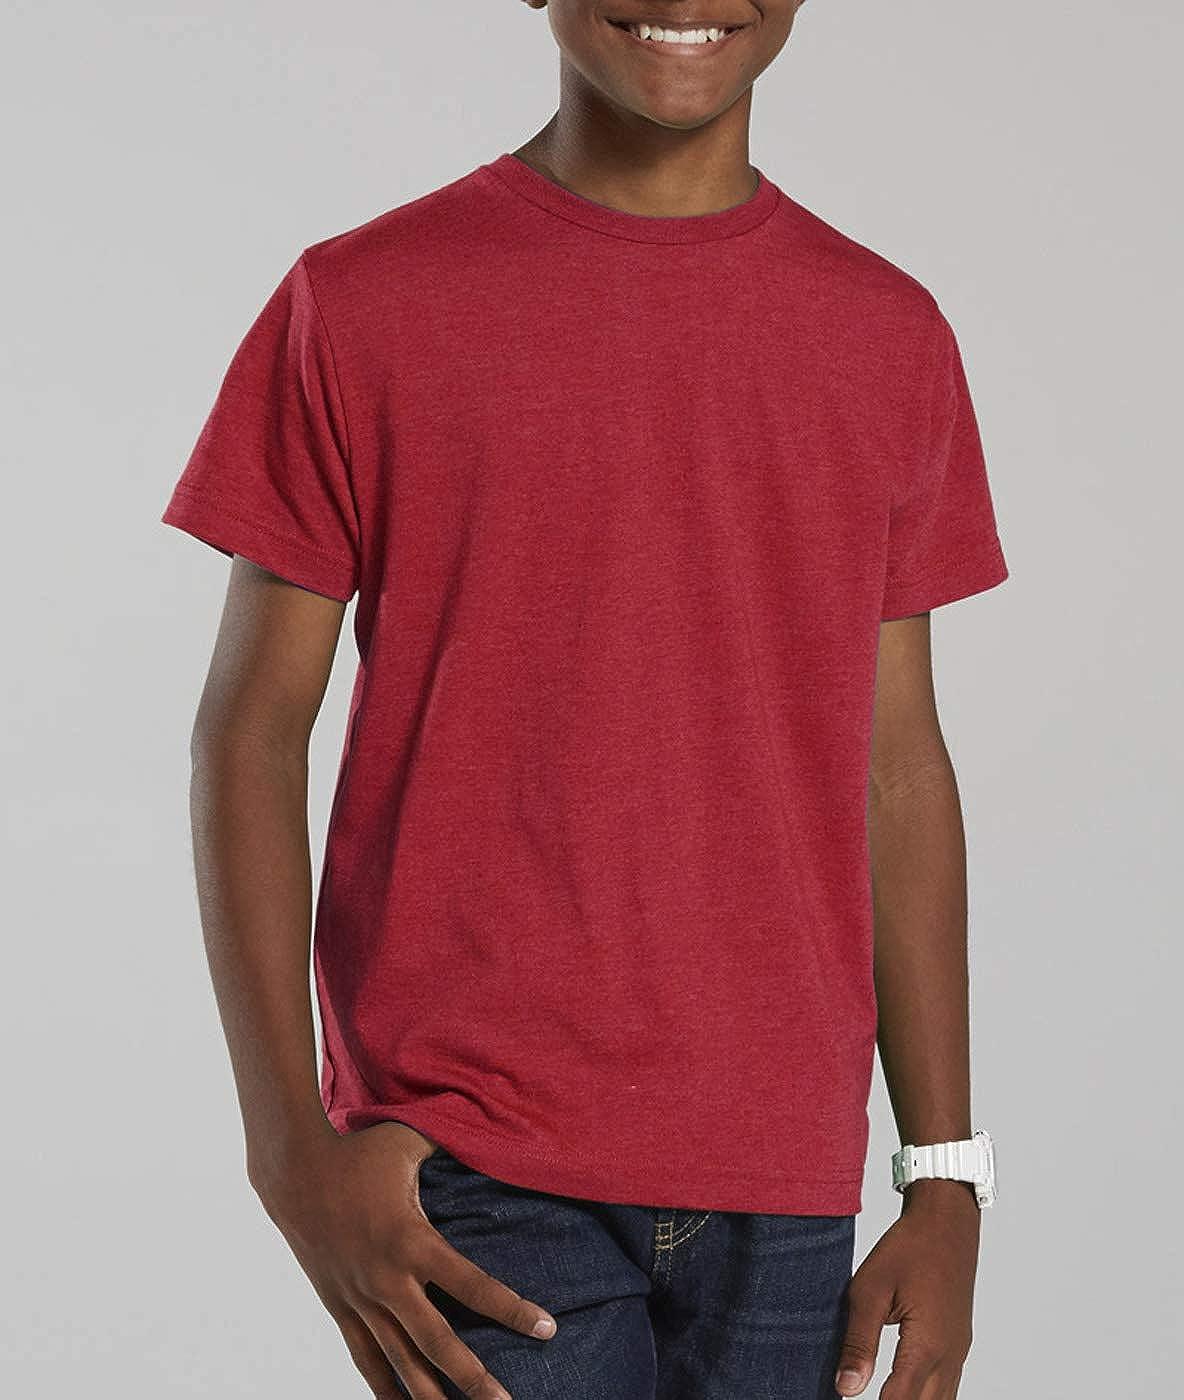 LAT Sportswear Big Boys Heathered Fine Jersey T-Shirt